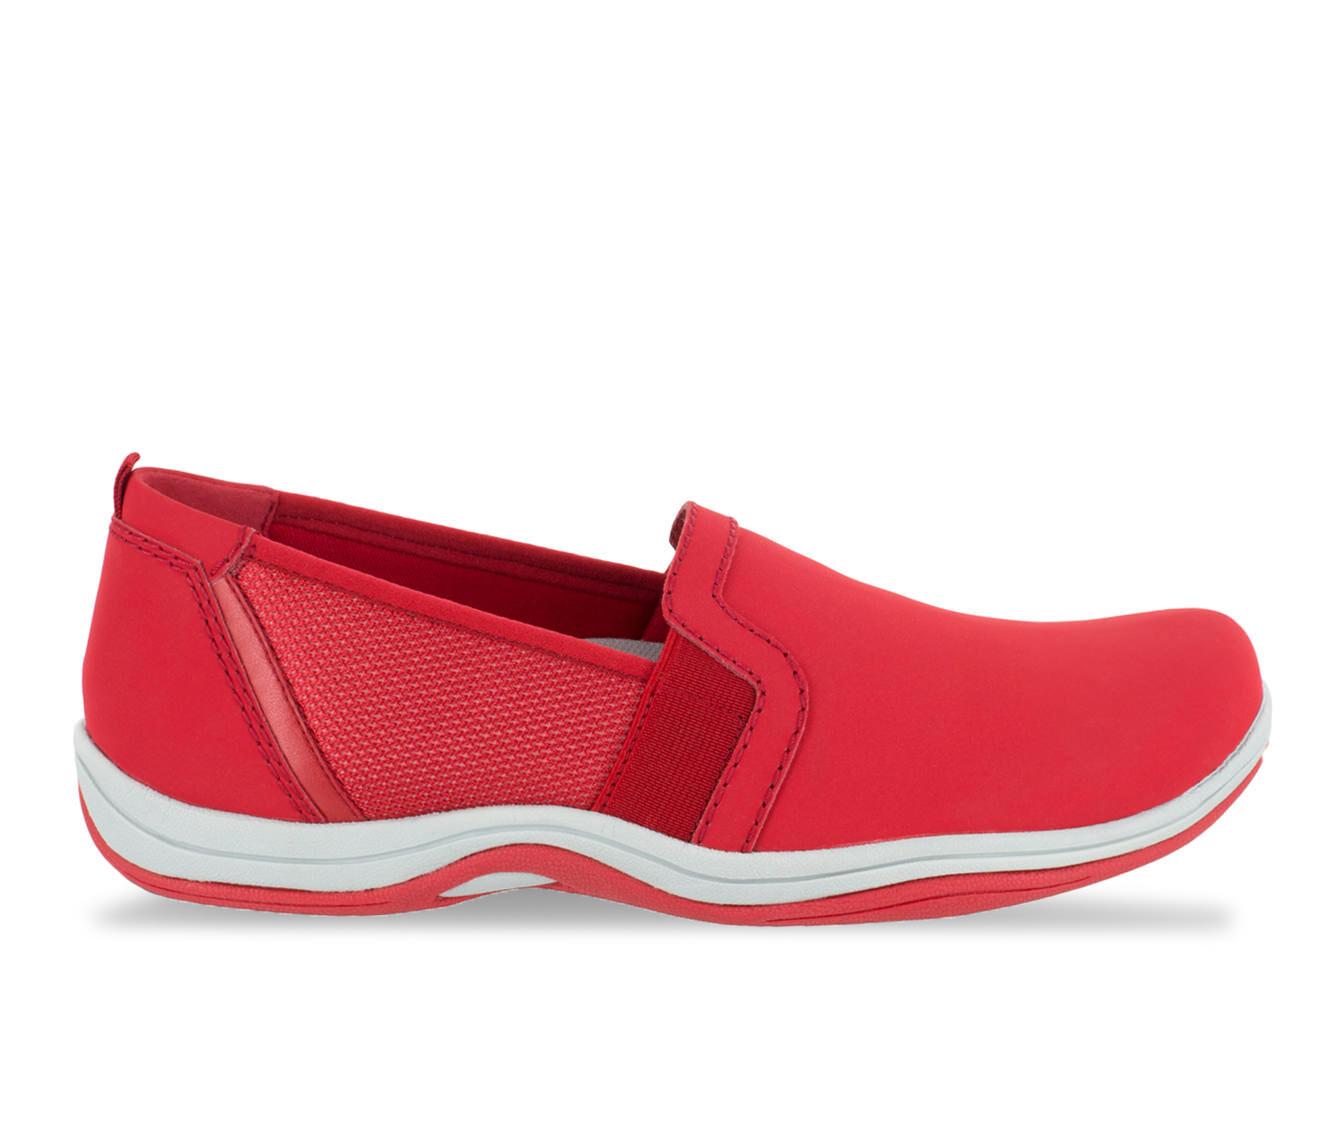 uk shoes_kd3232